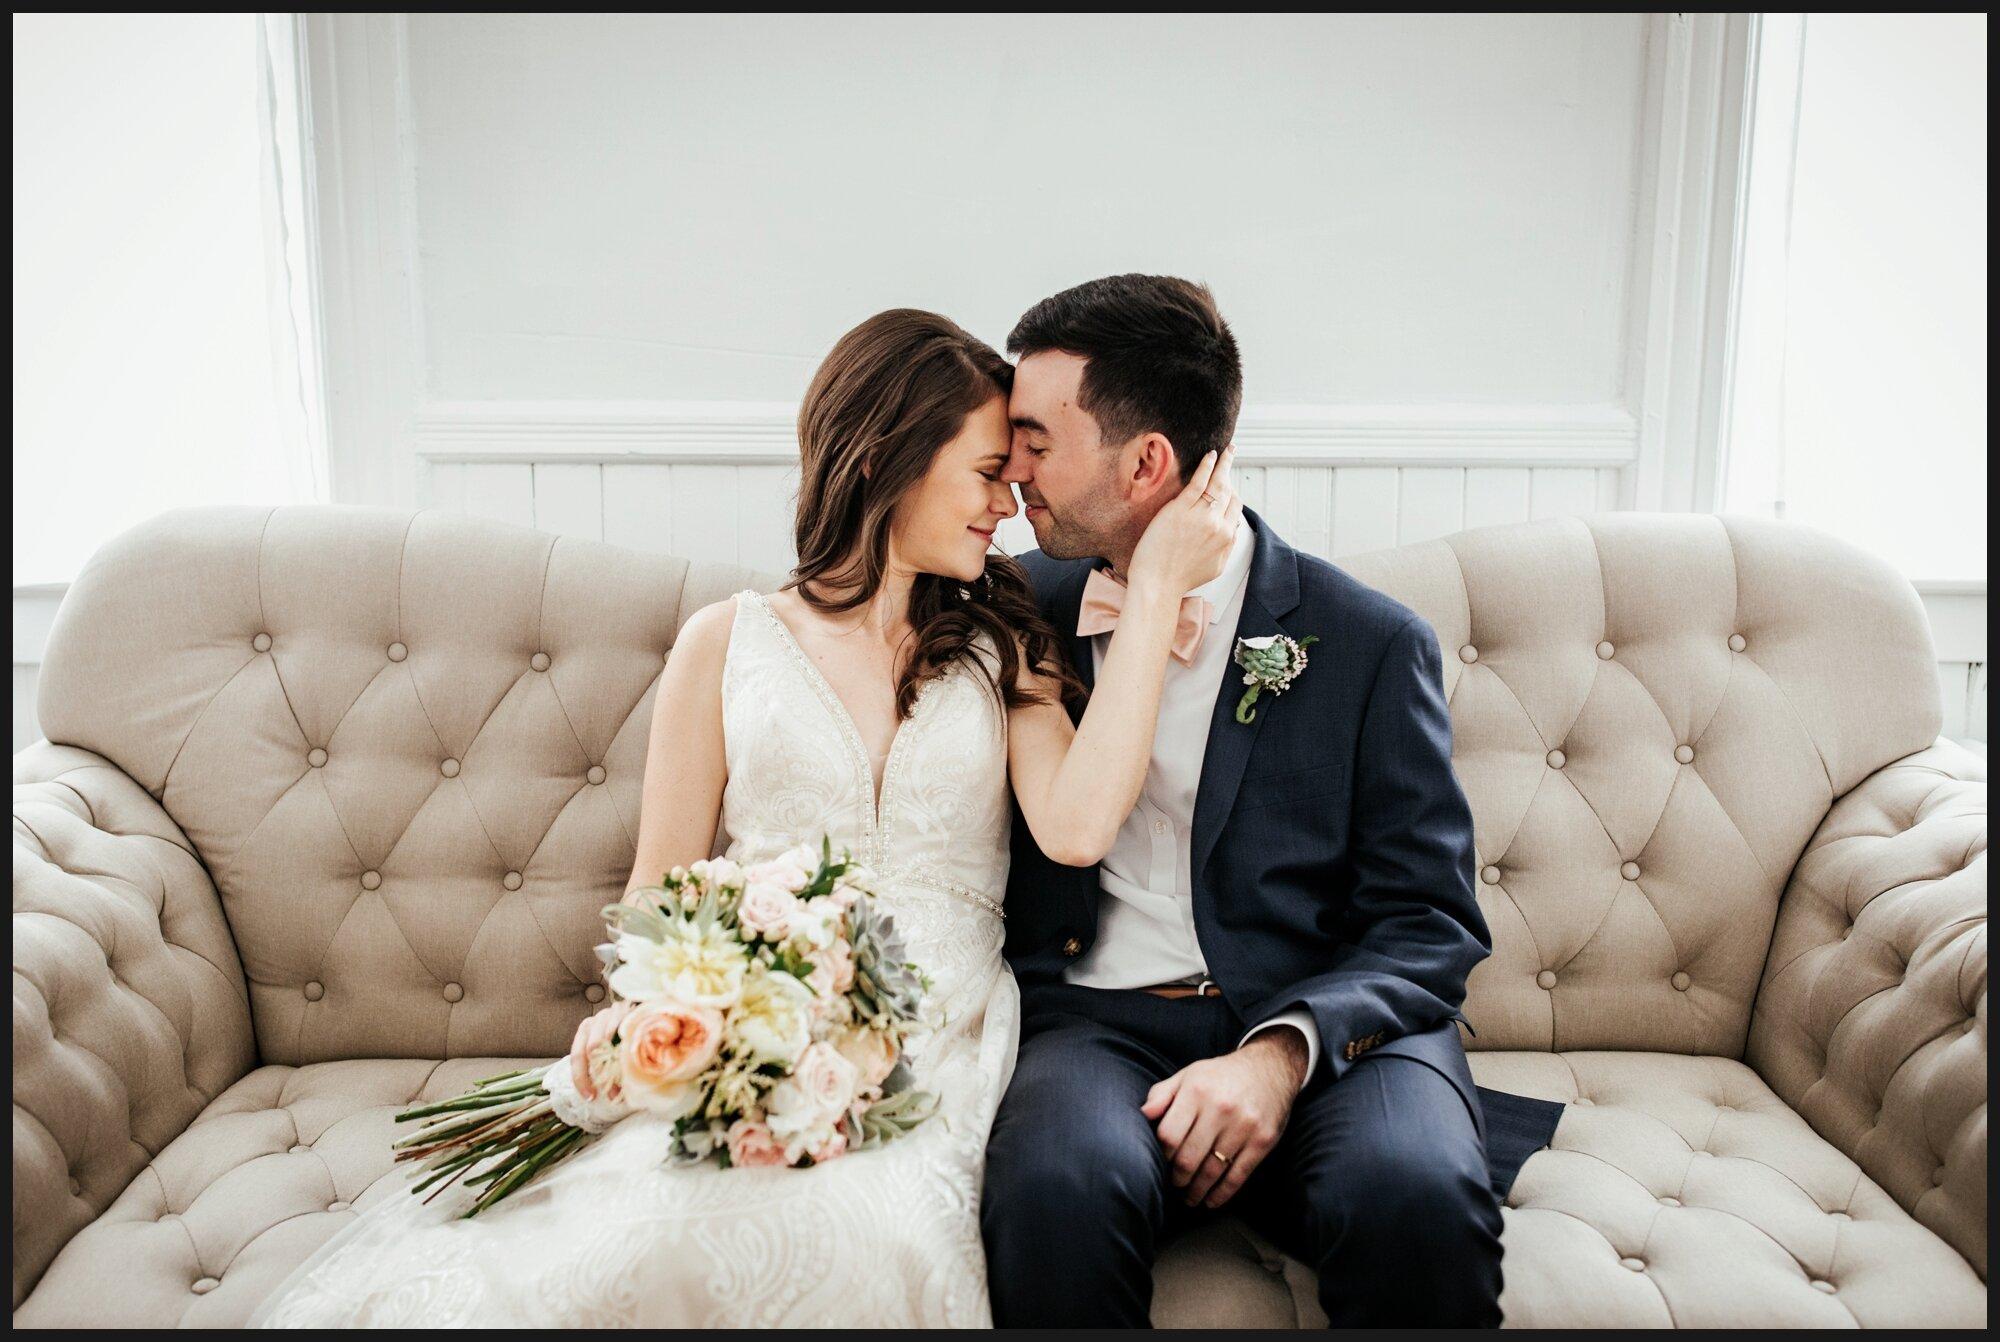 Orlando-Wedding-Photographer-destination-wedding-photographer-florida-wedding-photographer-hawaii-wedding-photographer_0684.jpg